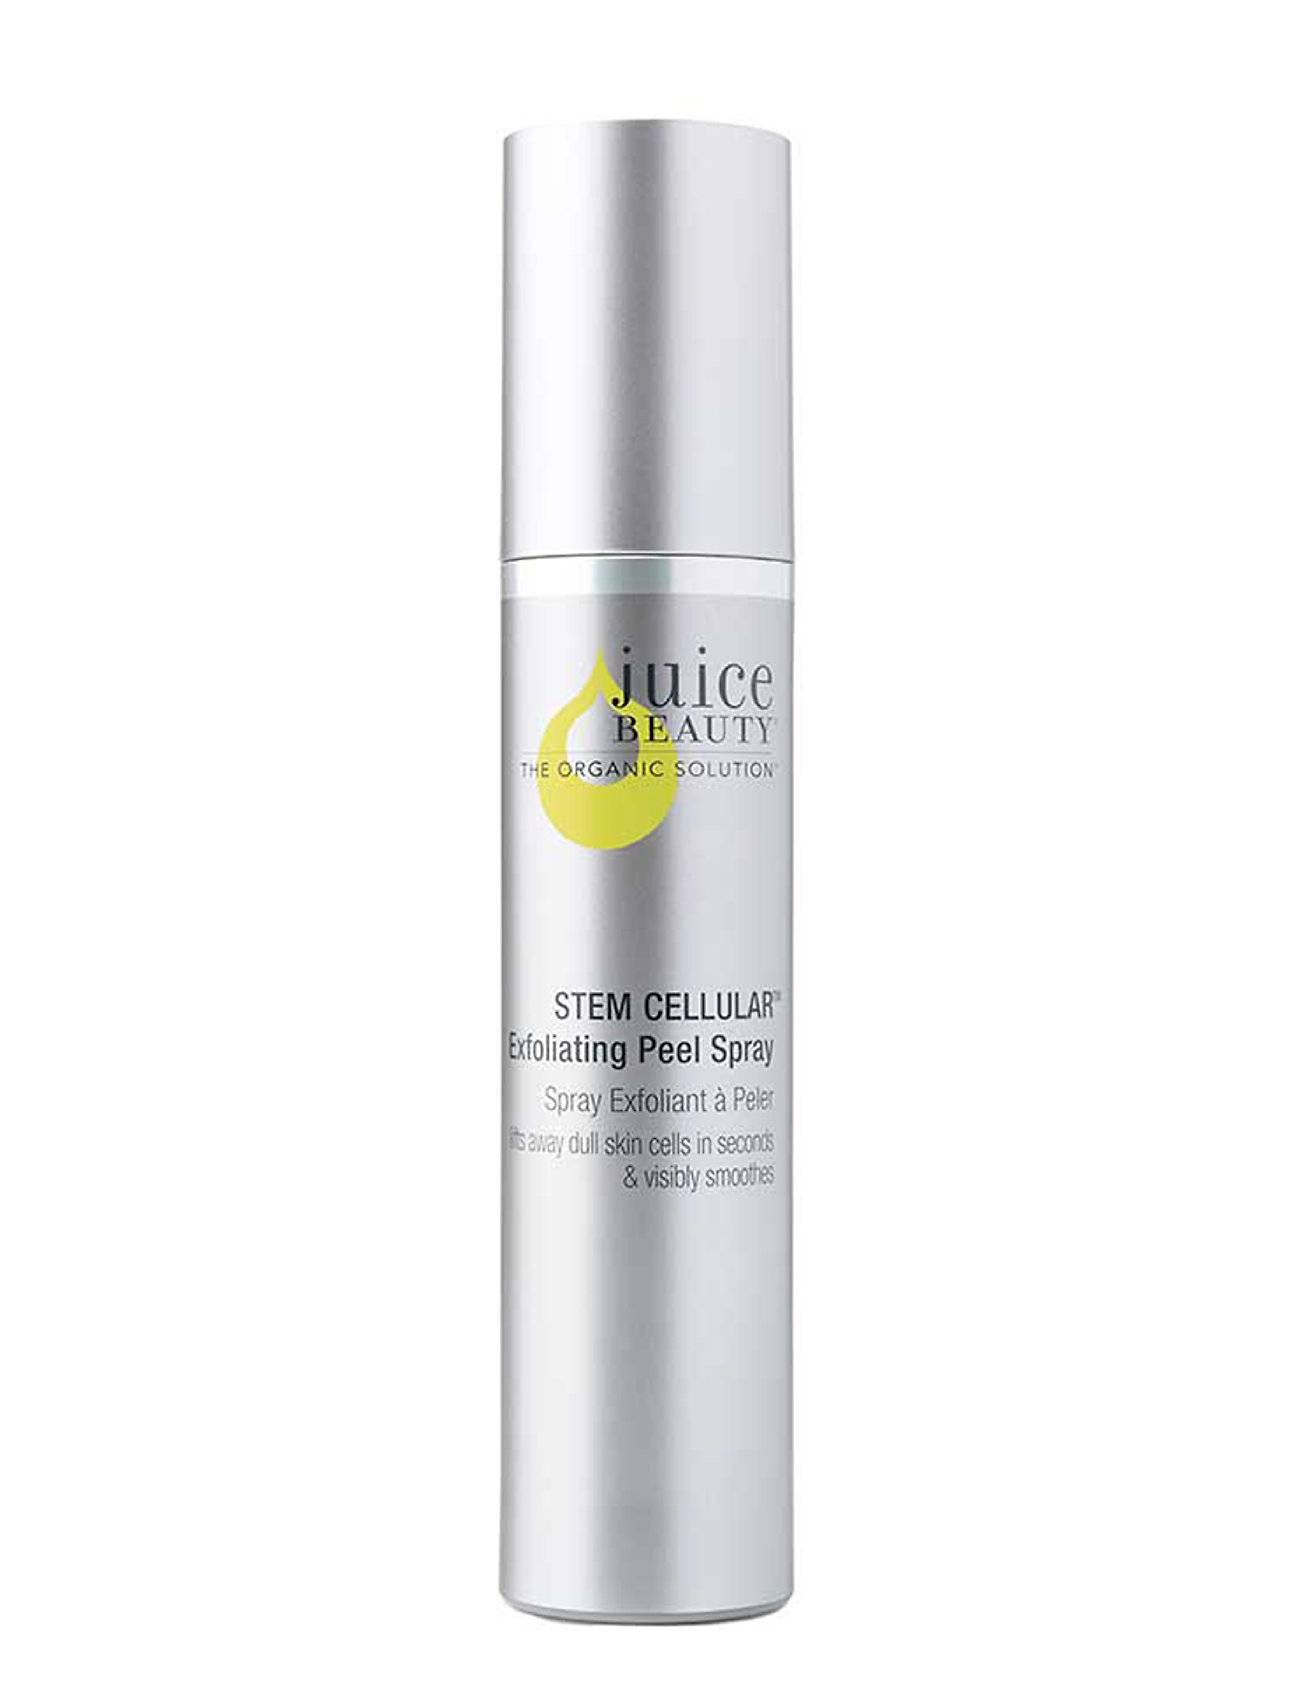 Juice Beauty Stem Cellular™ Exfoliating Peel Spray Kuorinta-aine Kasvojen Kuorinta Nude Juice Beauty